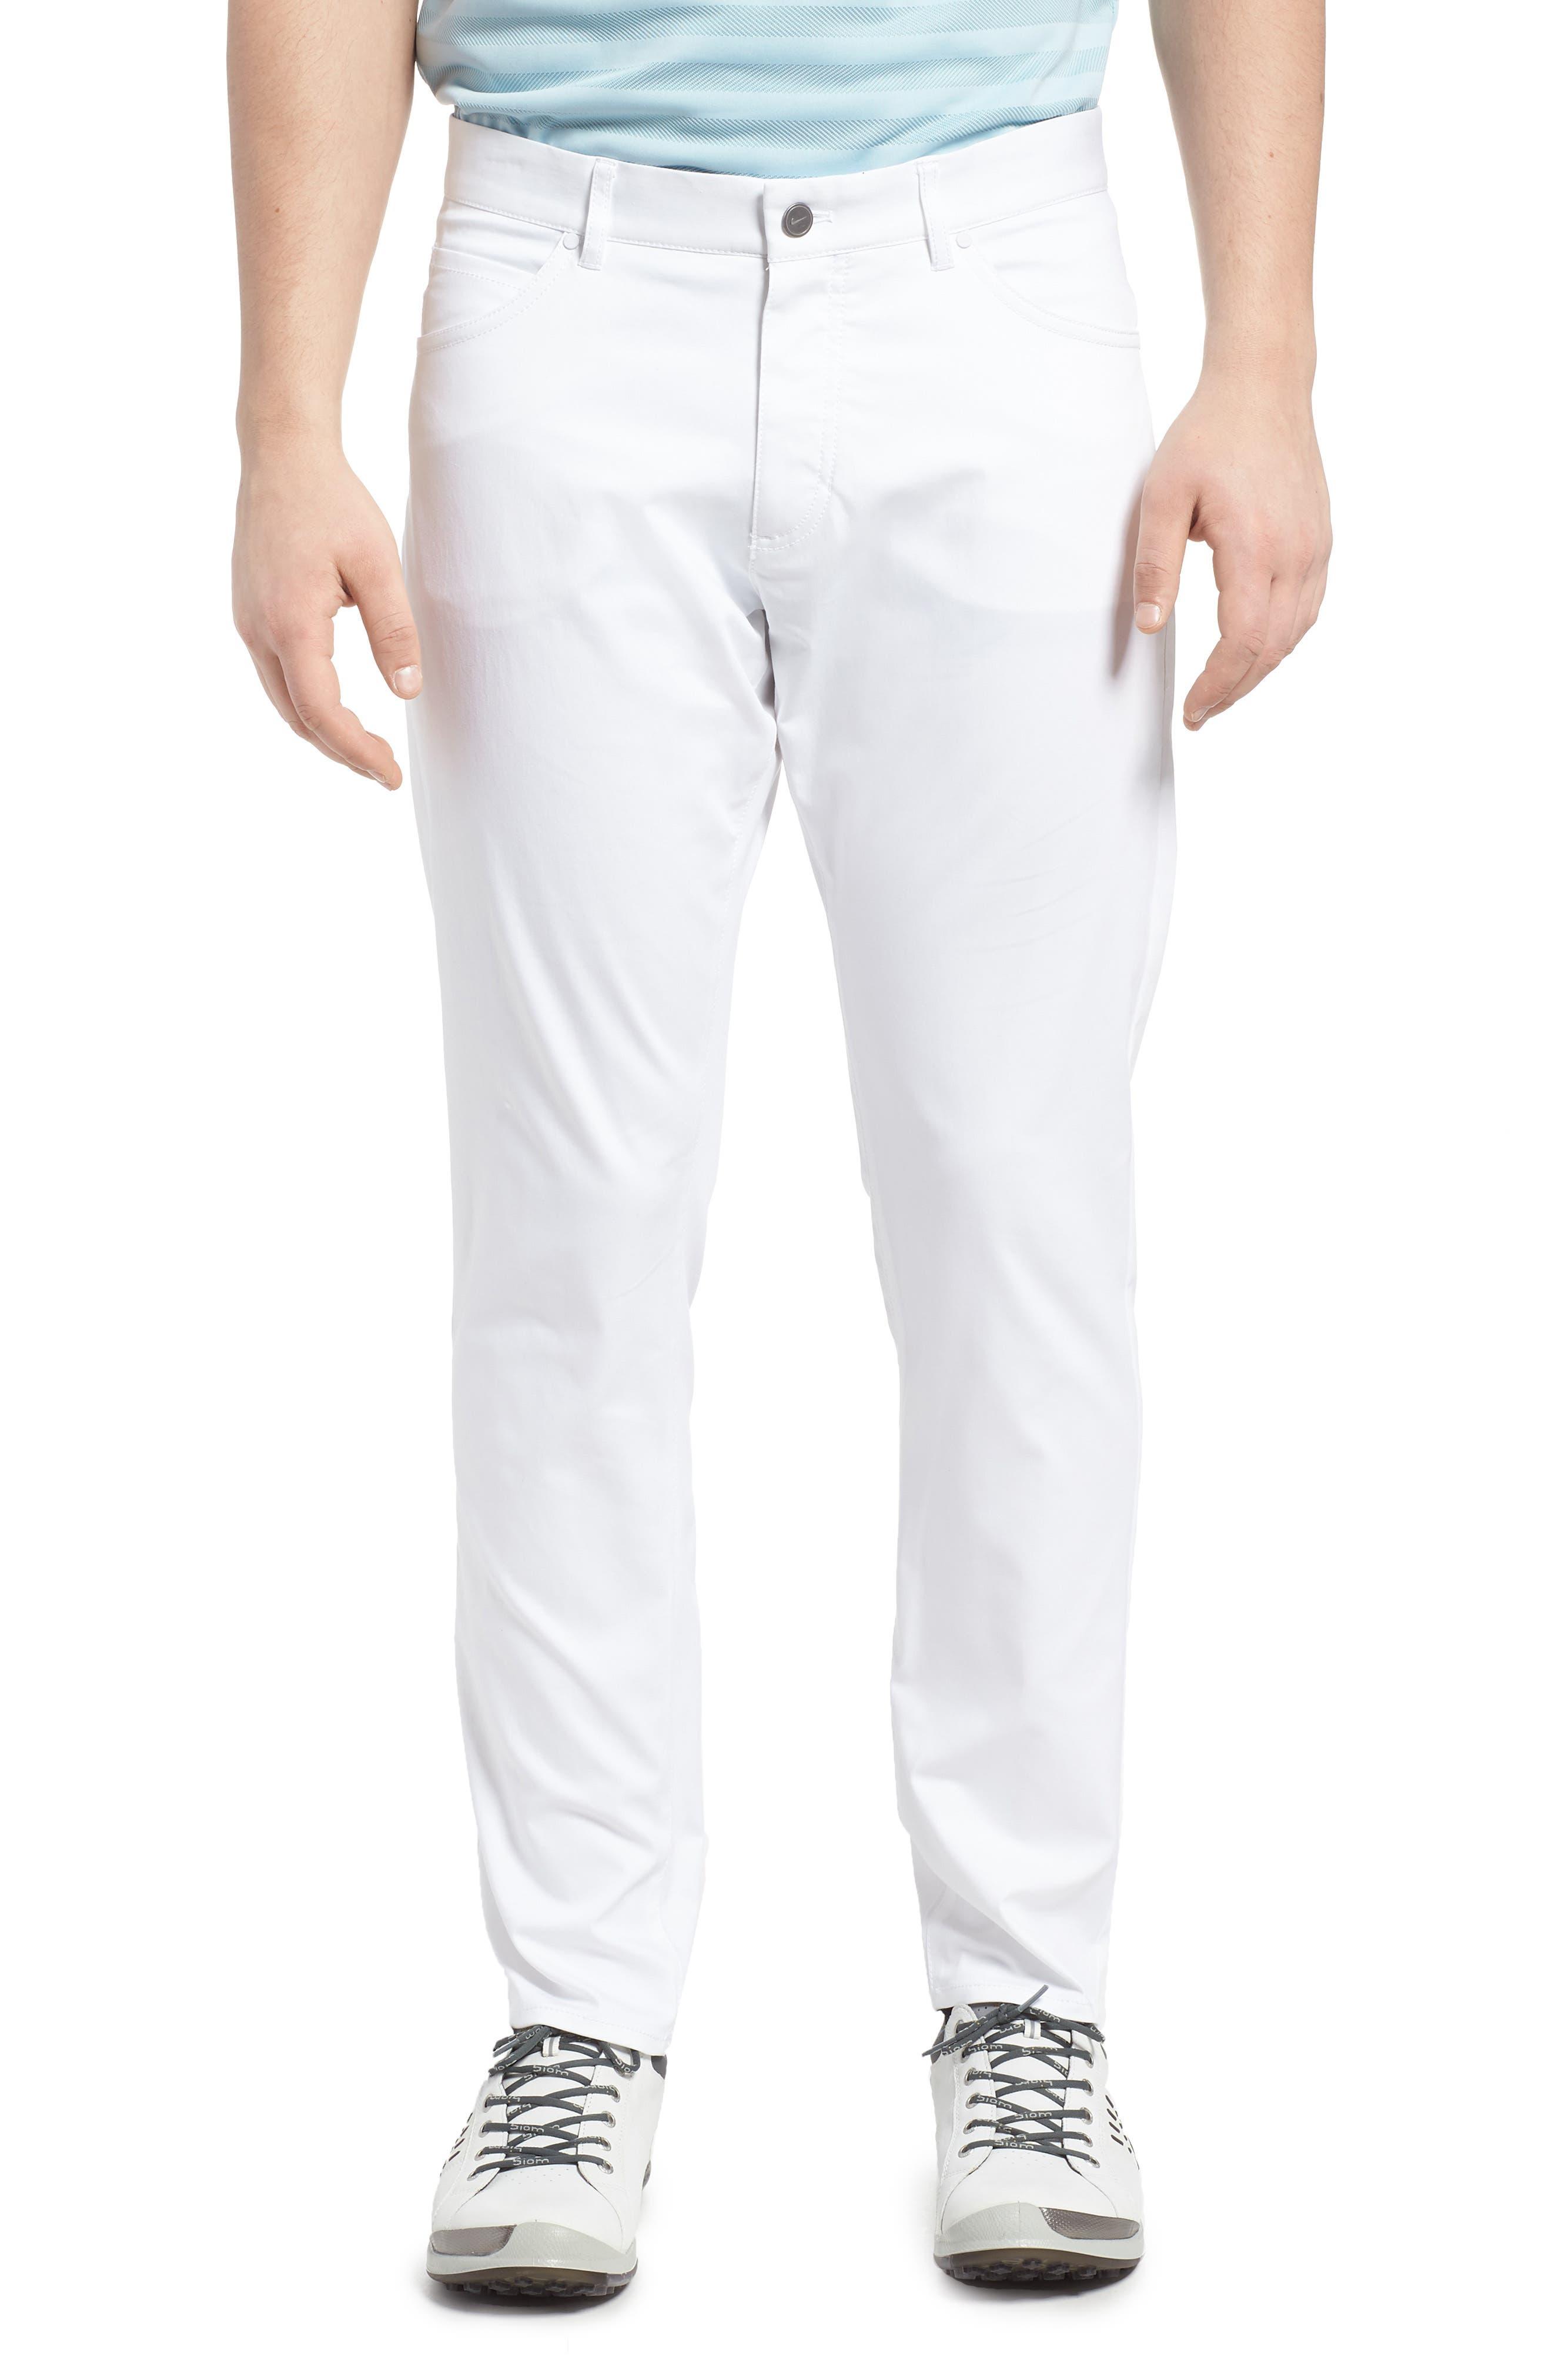 Main Image - Nike Dry Flex Slim Fit Golf Pants